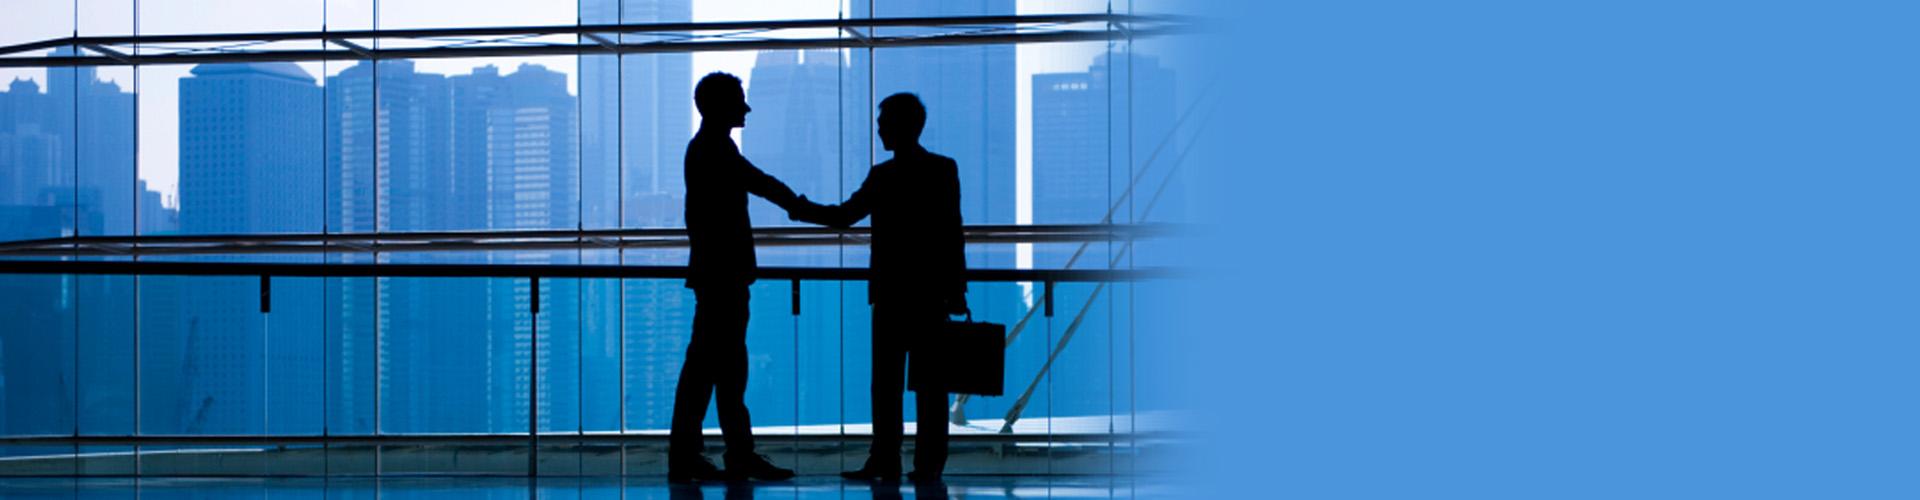 Best home & contents insurance deals